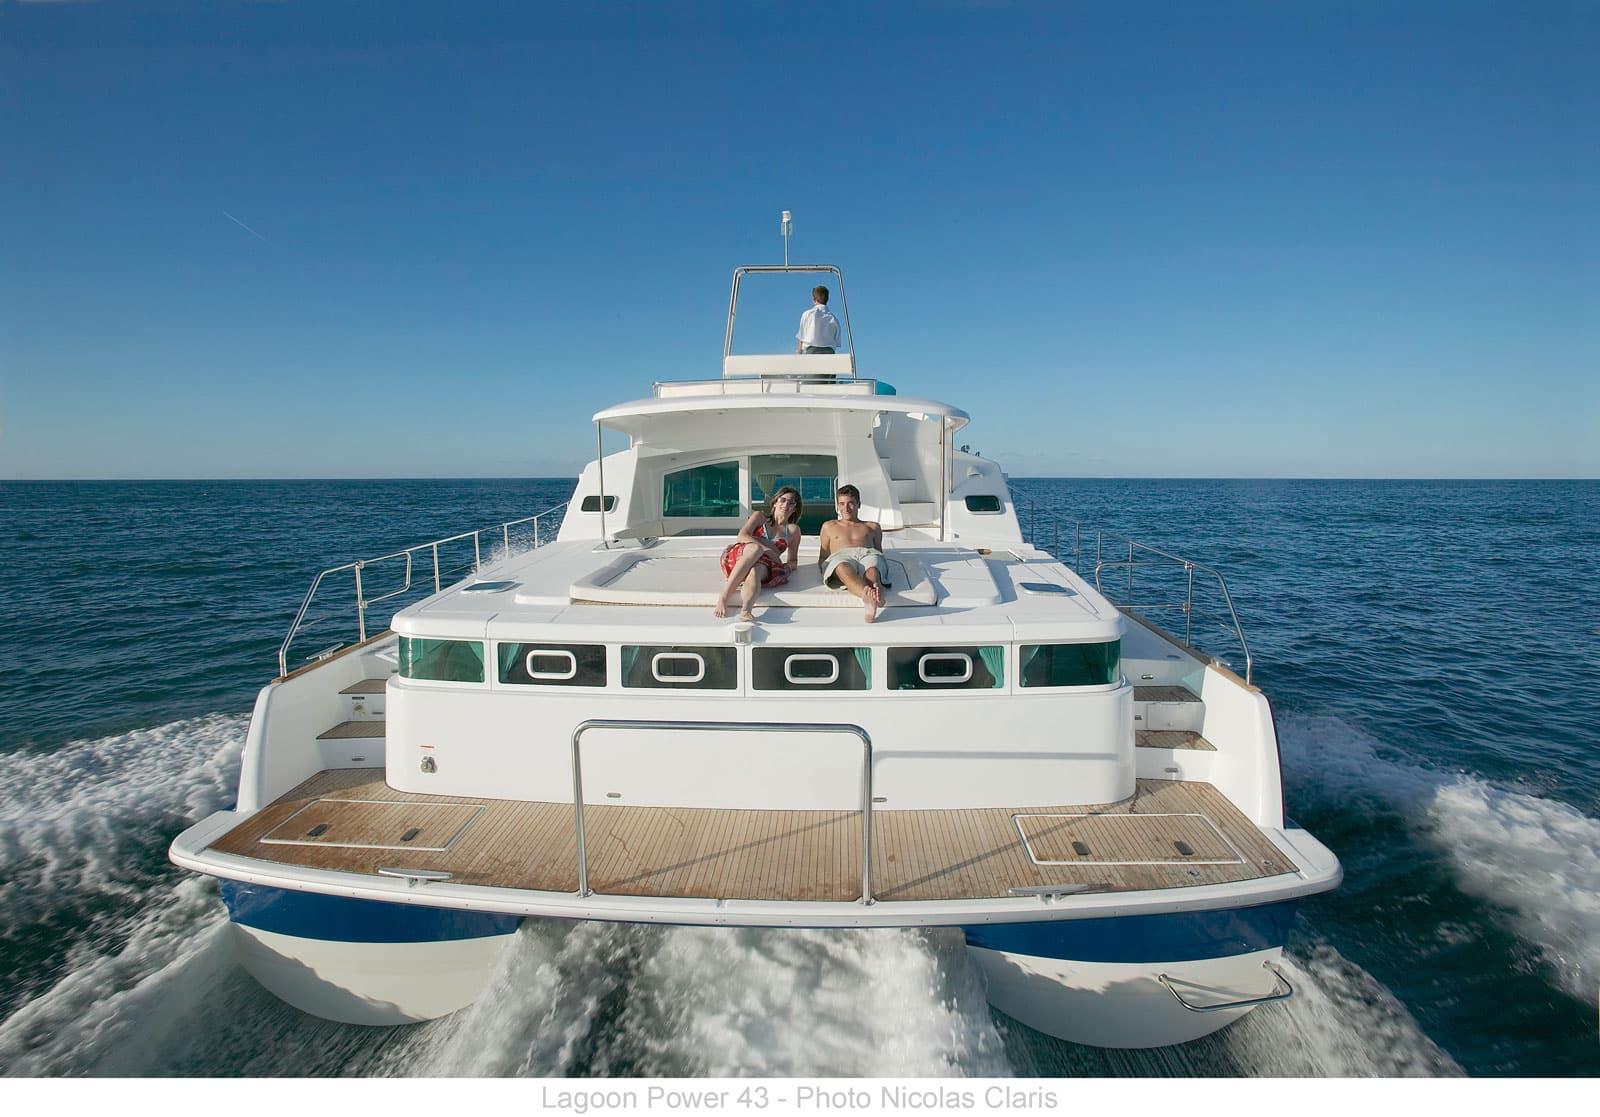 lagoon power 43-yacht-charter-croatia-sailing-holidays-croatia-booking-yacht-charter-croatia-catamarans-sailboats-motorboats-gulets-luxury-yachts-boat-rental-croatia 4